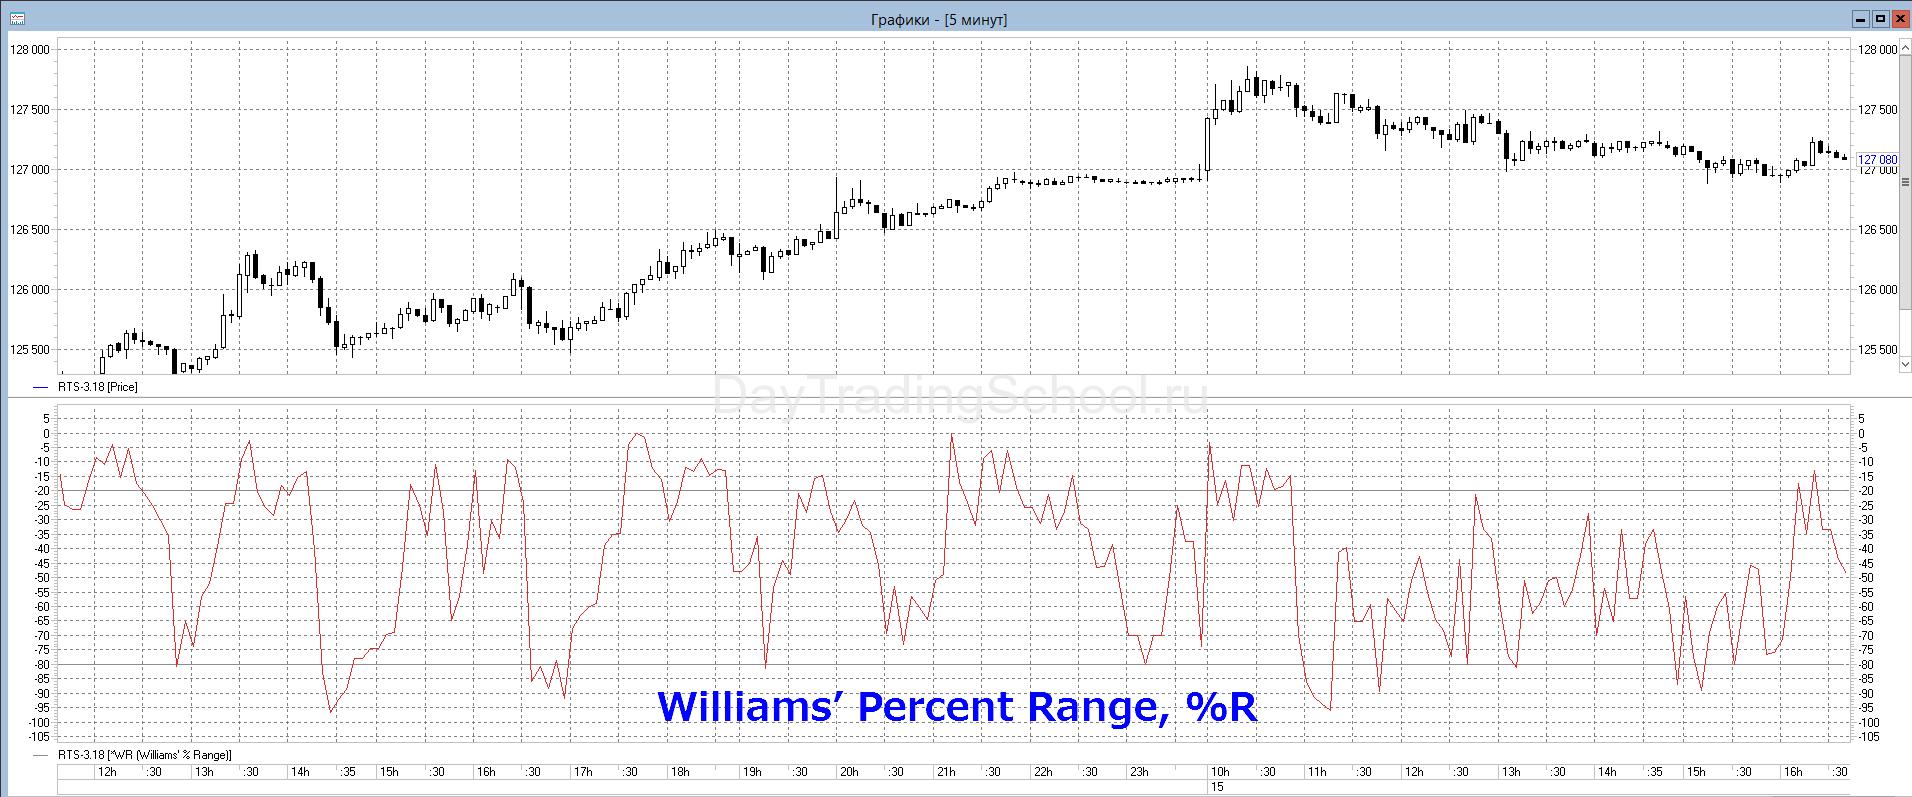 Williams-Percent-Range-1